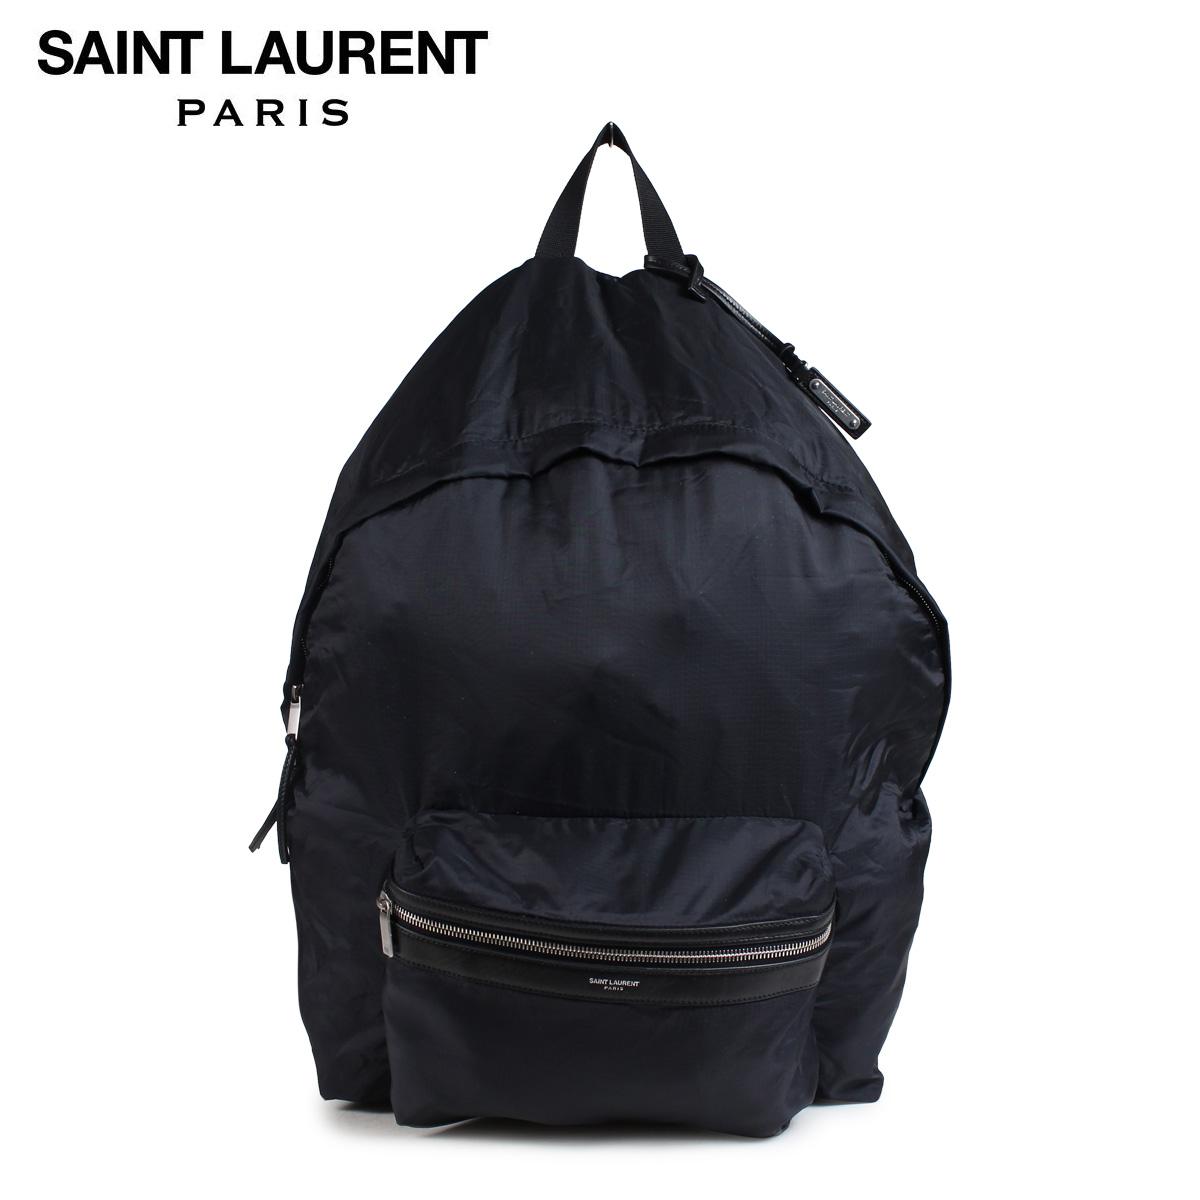 SAINT LAURENT PARIS サンローラン パリ バッグ メンズ レディース バックパック リュック DOUBLE TOP ZIP BACKPACK ブラック 524903 9RP1E